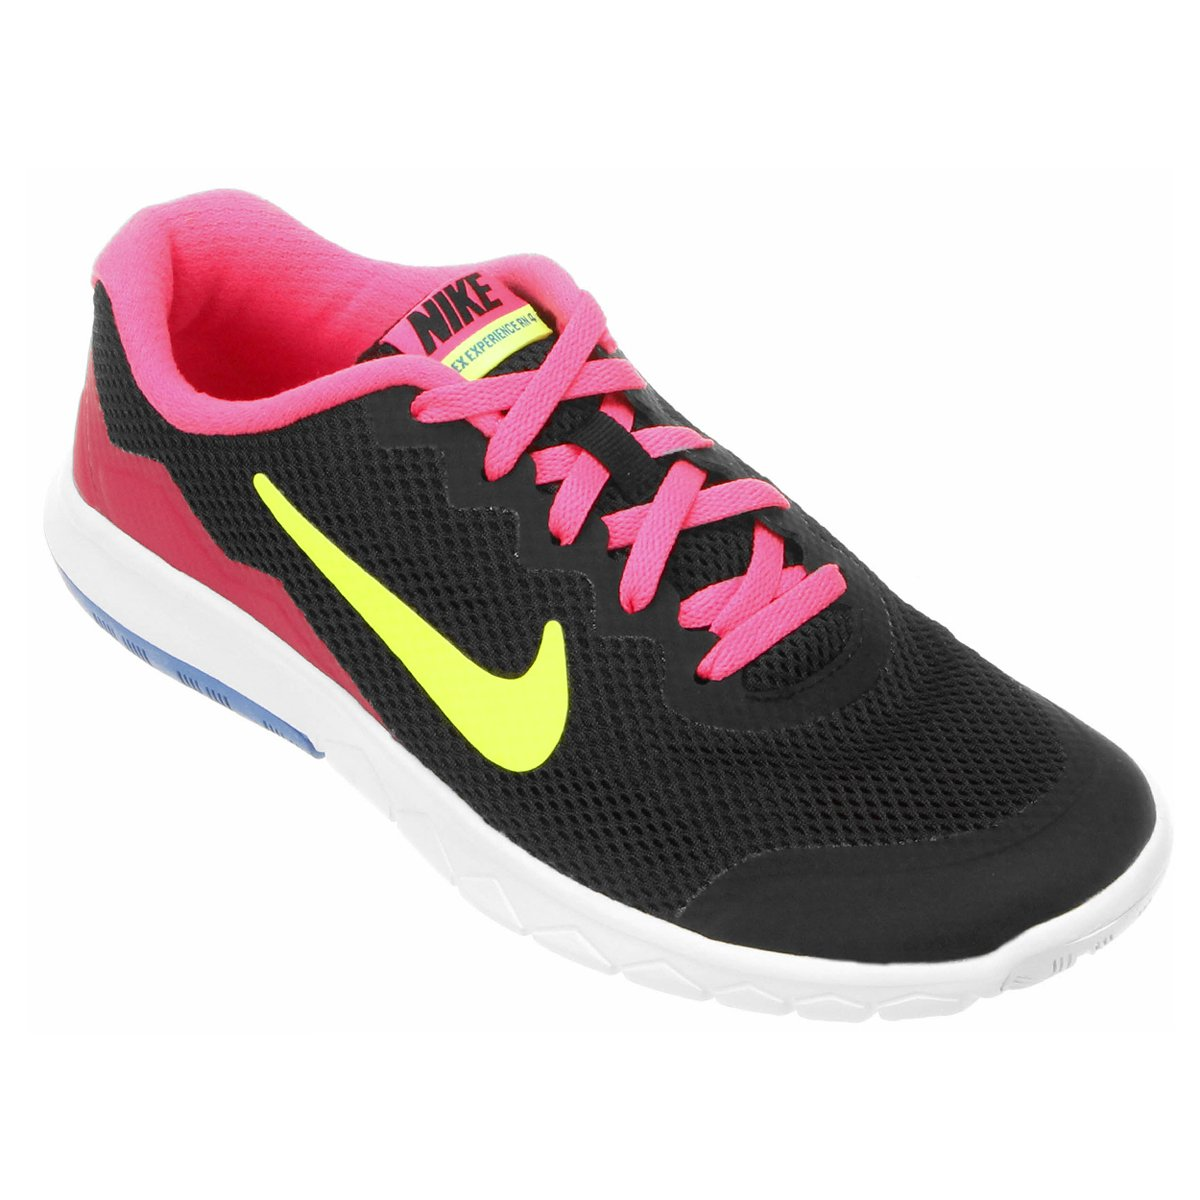 4ac1f2869fa Tenis Nike Feminino Casual Preto E Rosa - naturallycurlye.com